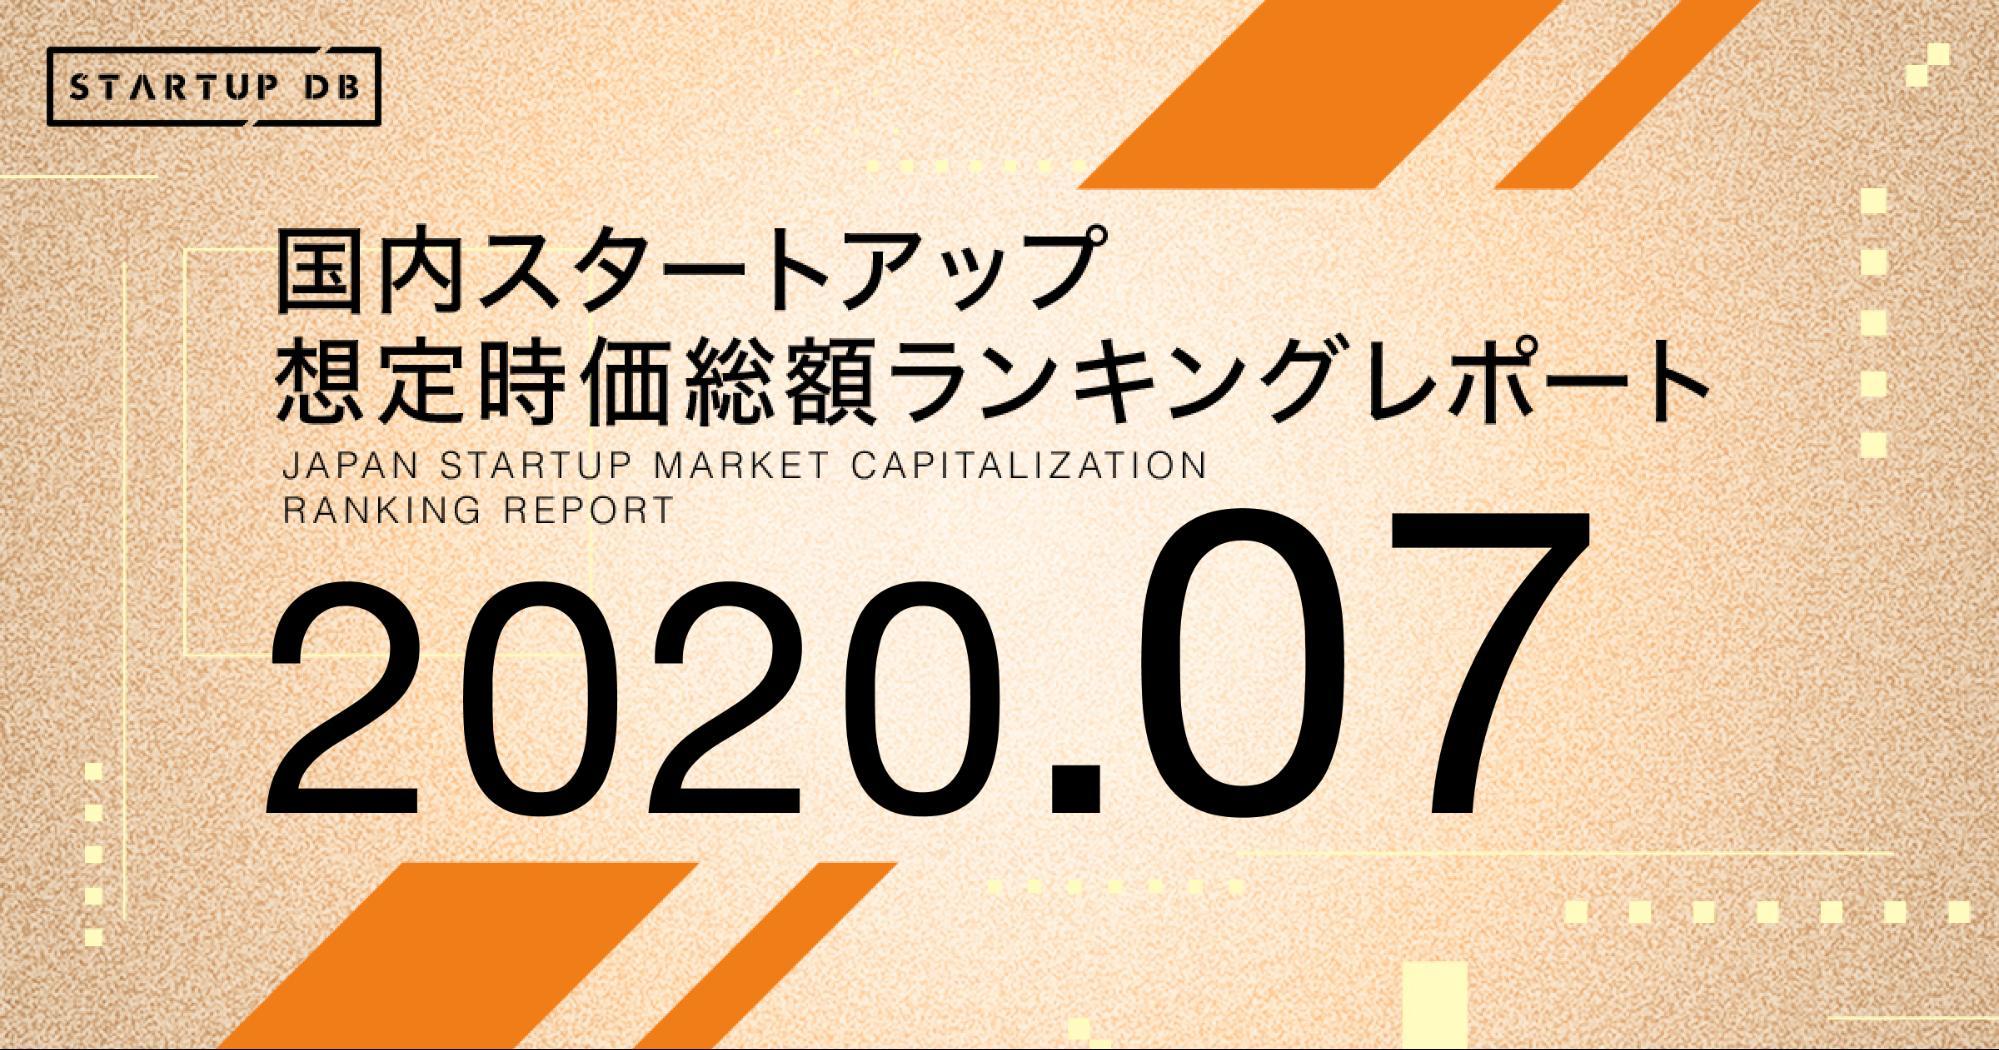 【STARTUP DB】調査結果 国内スタートアップ想定時価総額ランキング(2020年7月) Mobility Technologiesが新規ランクイン、事業別では自動車関連企業が4社に